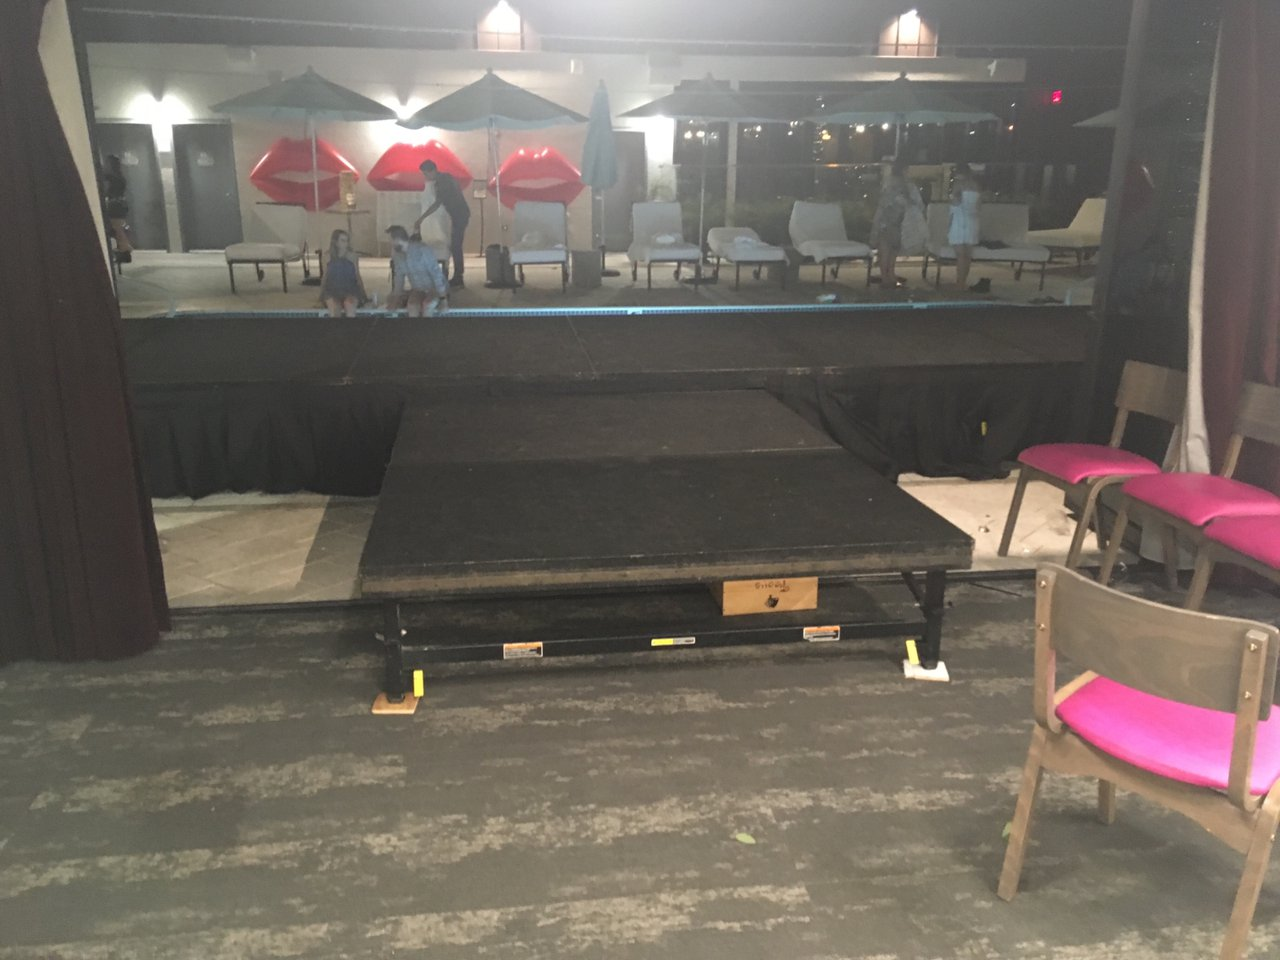 Fashion show @ Found RE Phoenix Hotel photo E1AA4041-8C0C-403C-84BF-9665DC241B1A.jpg